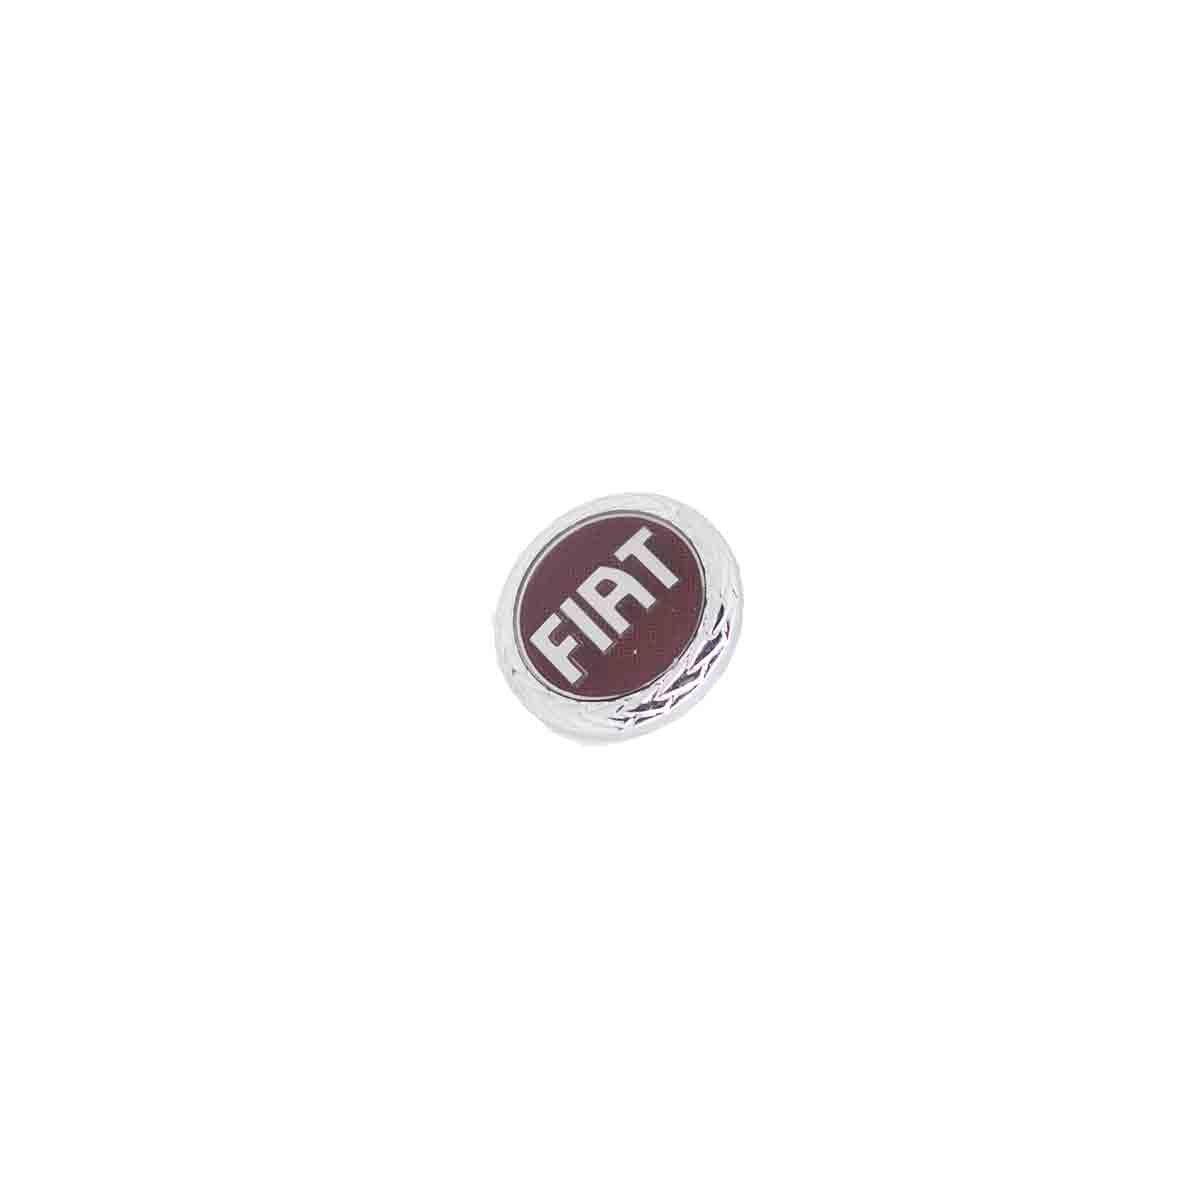 Emblema Grade Uno Fire 04/07